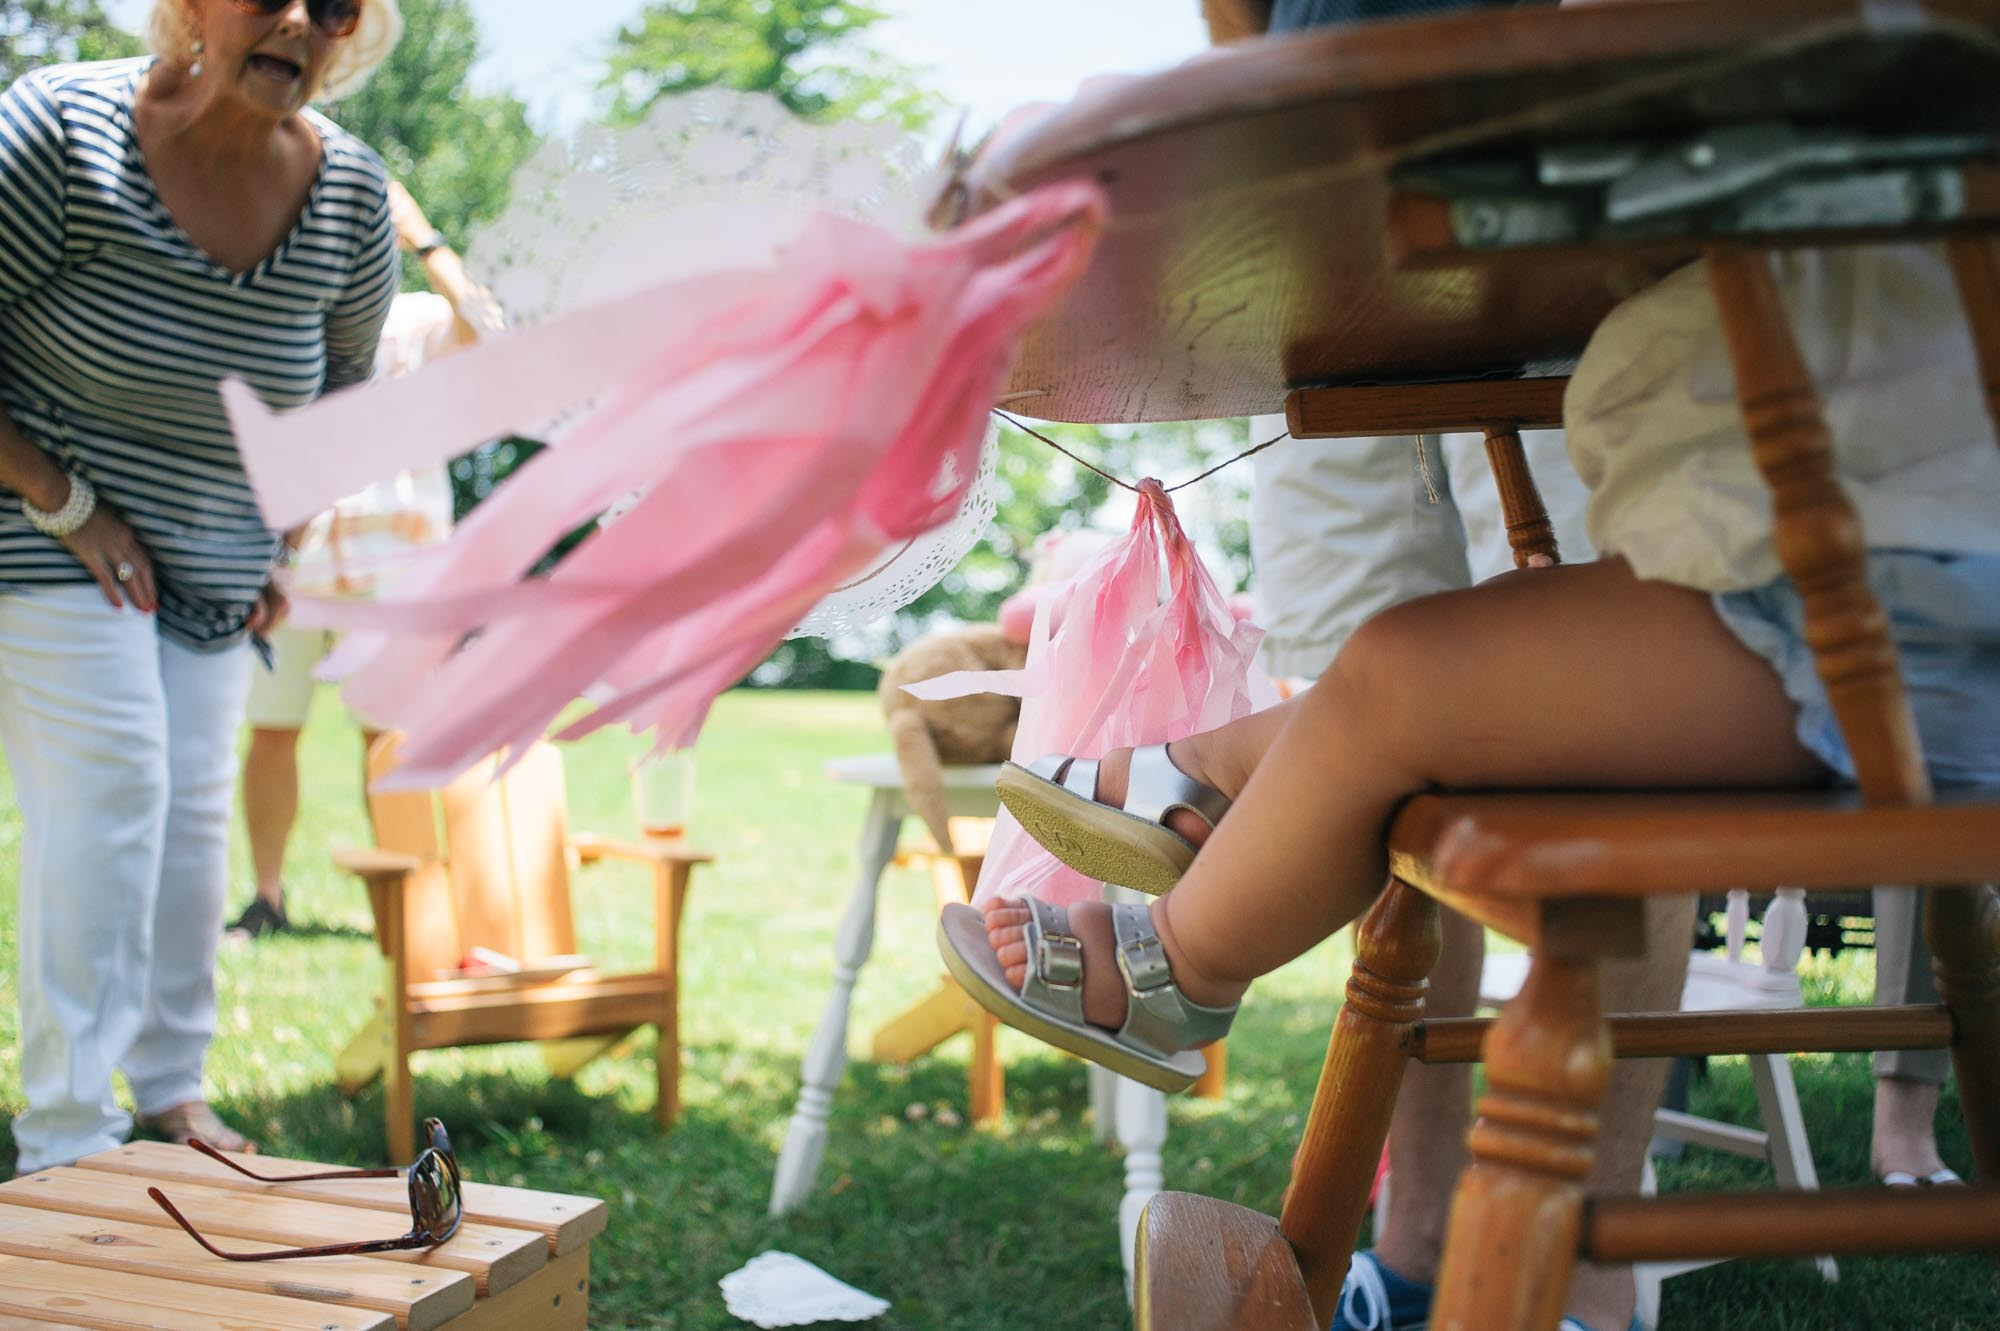 m.newsom-photography-one-year-old-girls-birthday-party-ideas-alice-in-wonderland (41 of 42).jpg